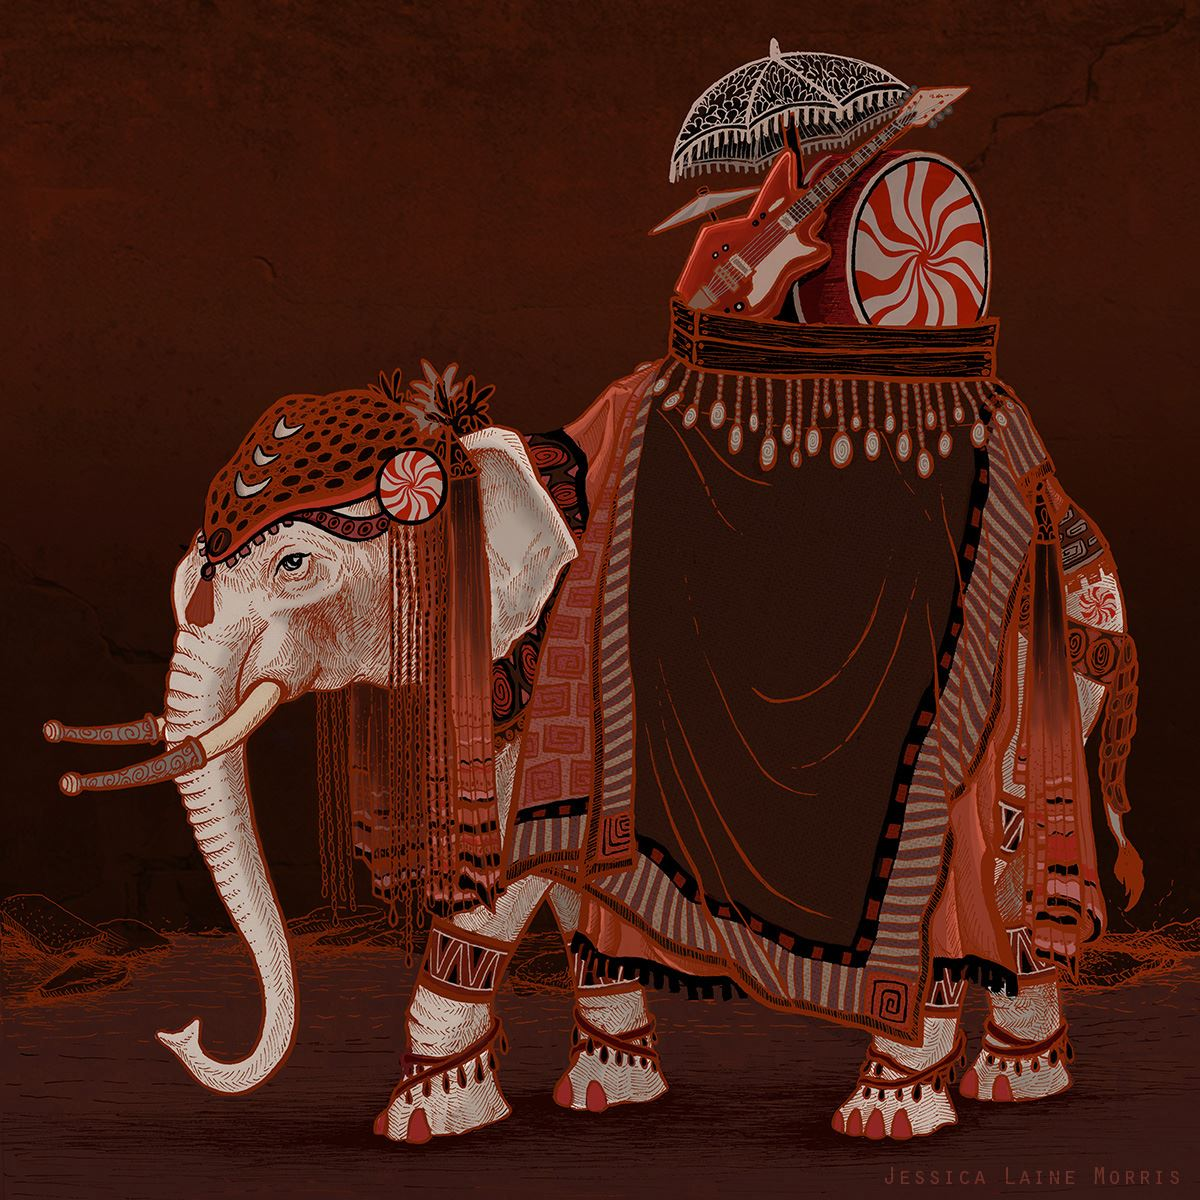 The White Stripes Elephant Album Cover Illustration